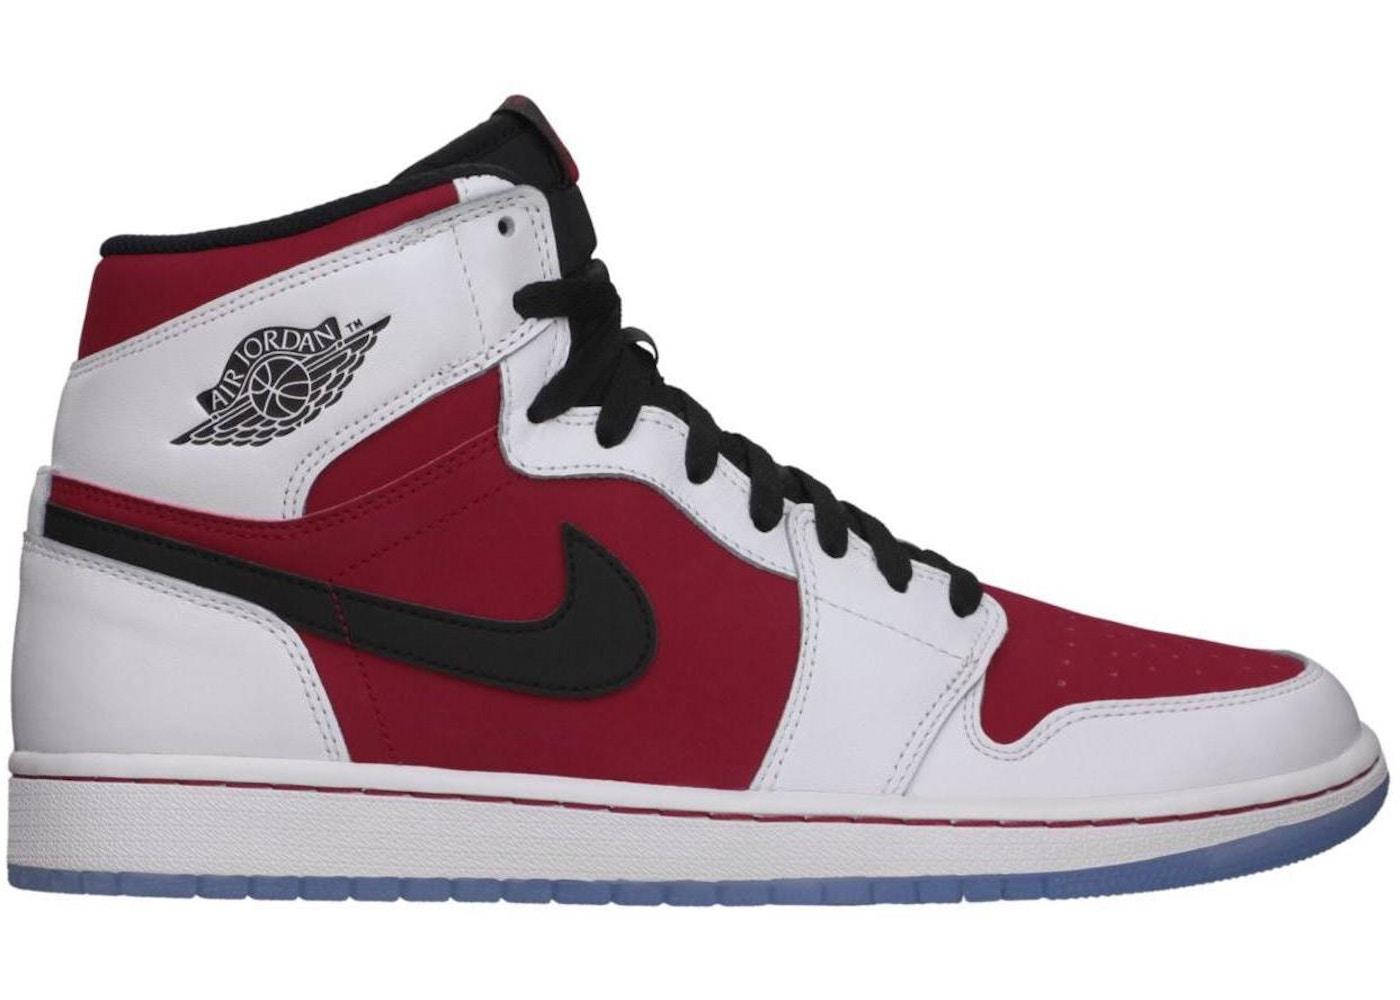 separation shoes bc25d 9e891 Jordan 1 Retro Carmine (2014) - 555088-123